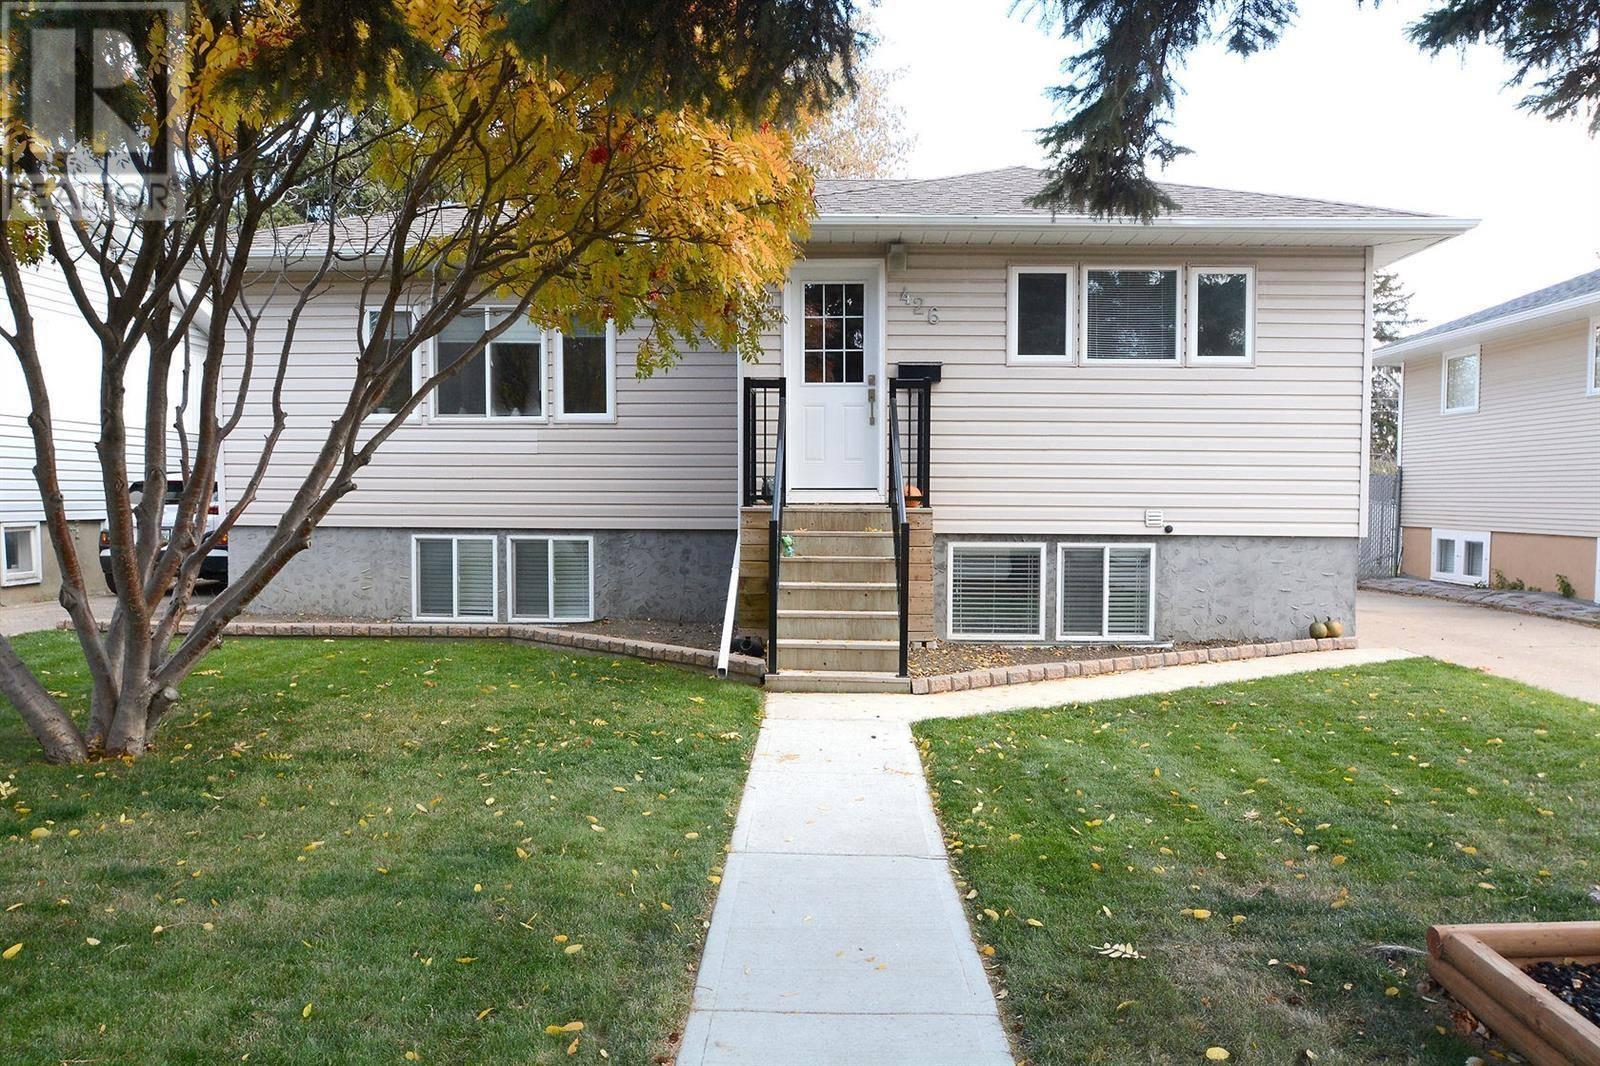 House for sale at 426 P Ave N Saskatoon Saskatchewan - MLS: SK788874